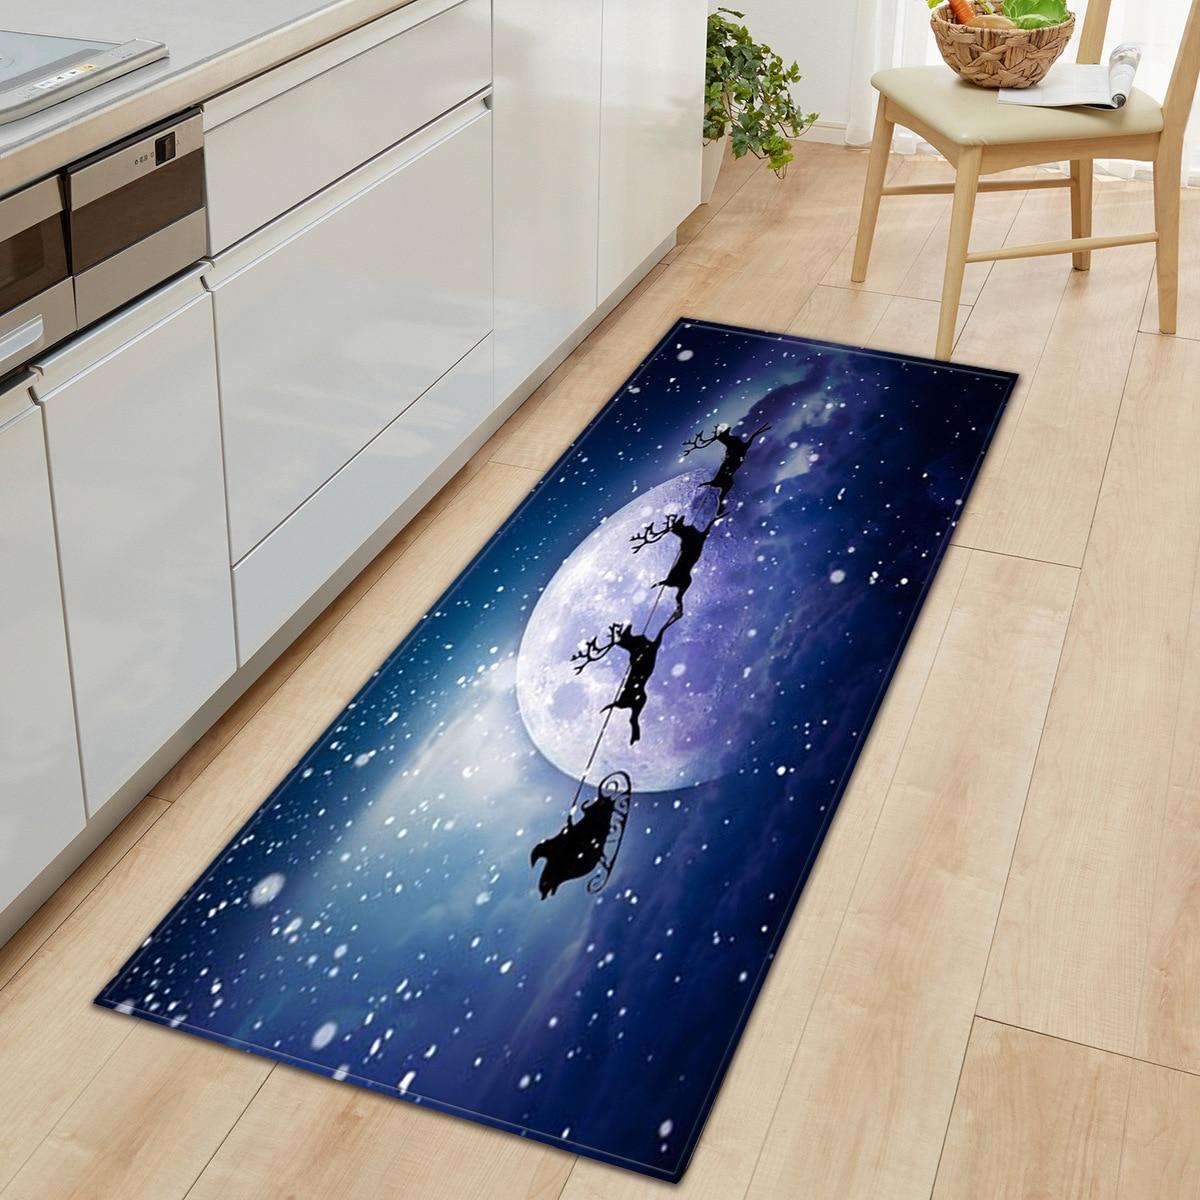 3 D Christmas Kitchen Area Rug Soft Flannel Floor Mat For Home Bedroom Living Room Non Slip Xmas Rug Bath Mats Aliexpress